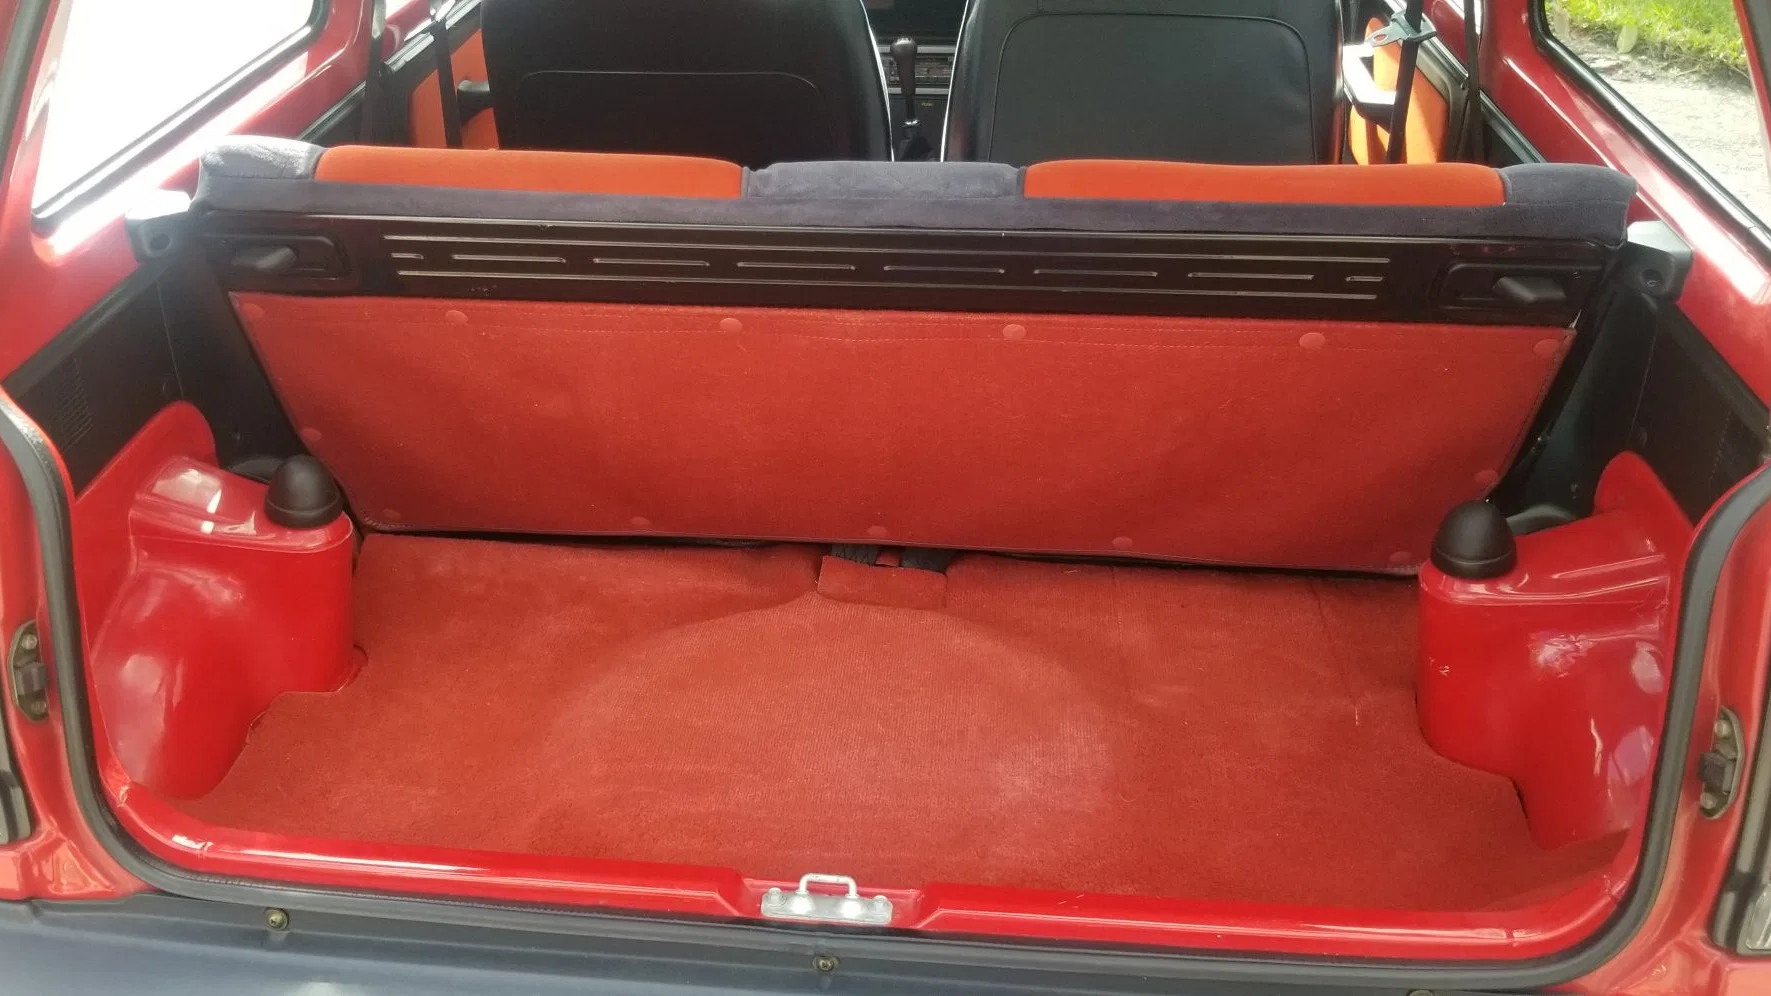 1983 Honda City Turbo backseat